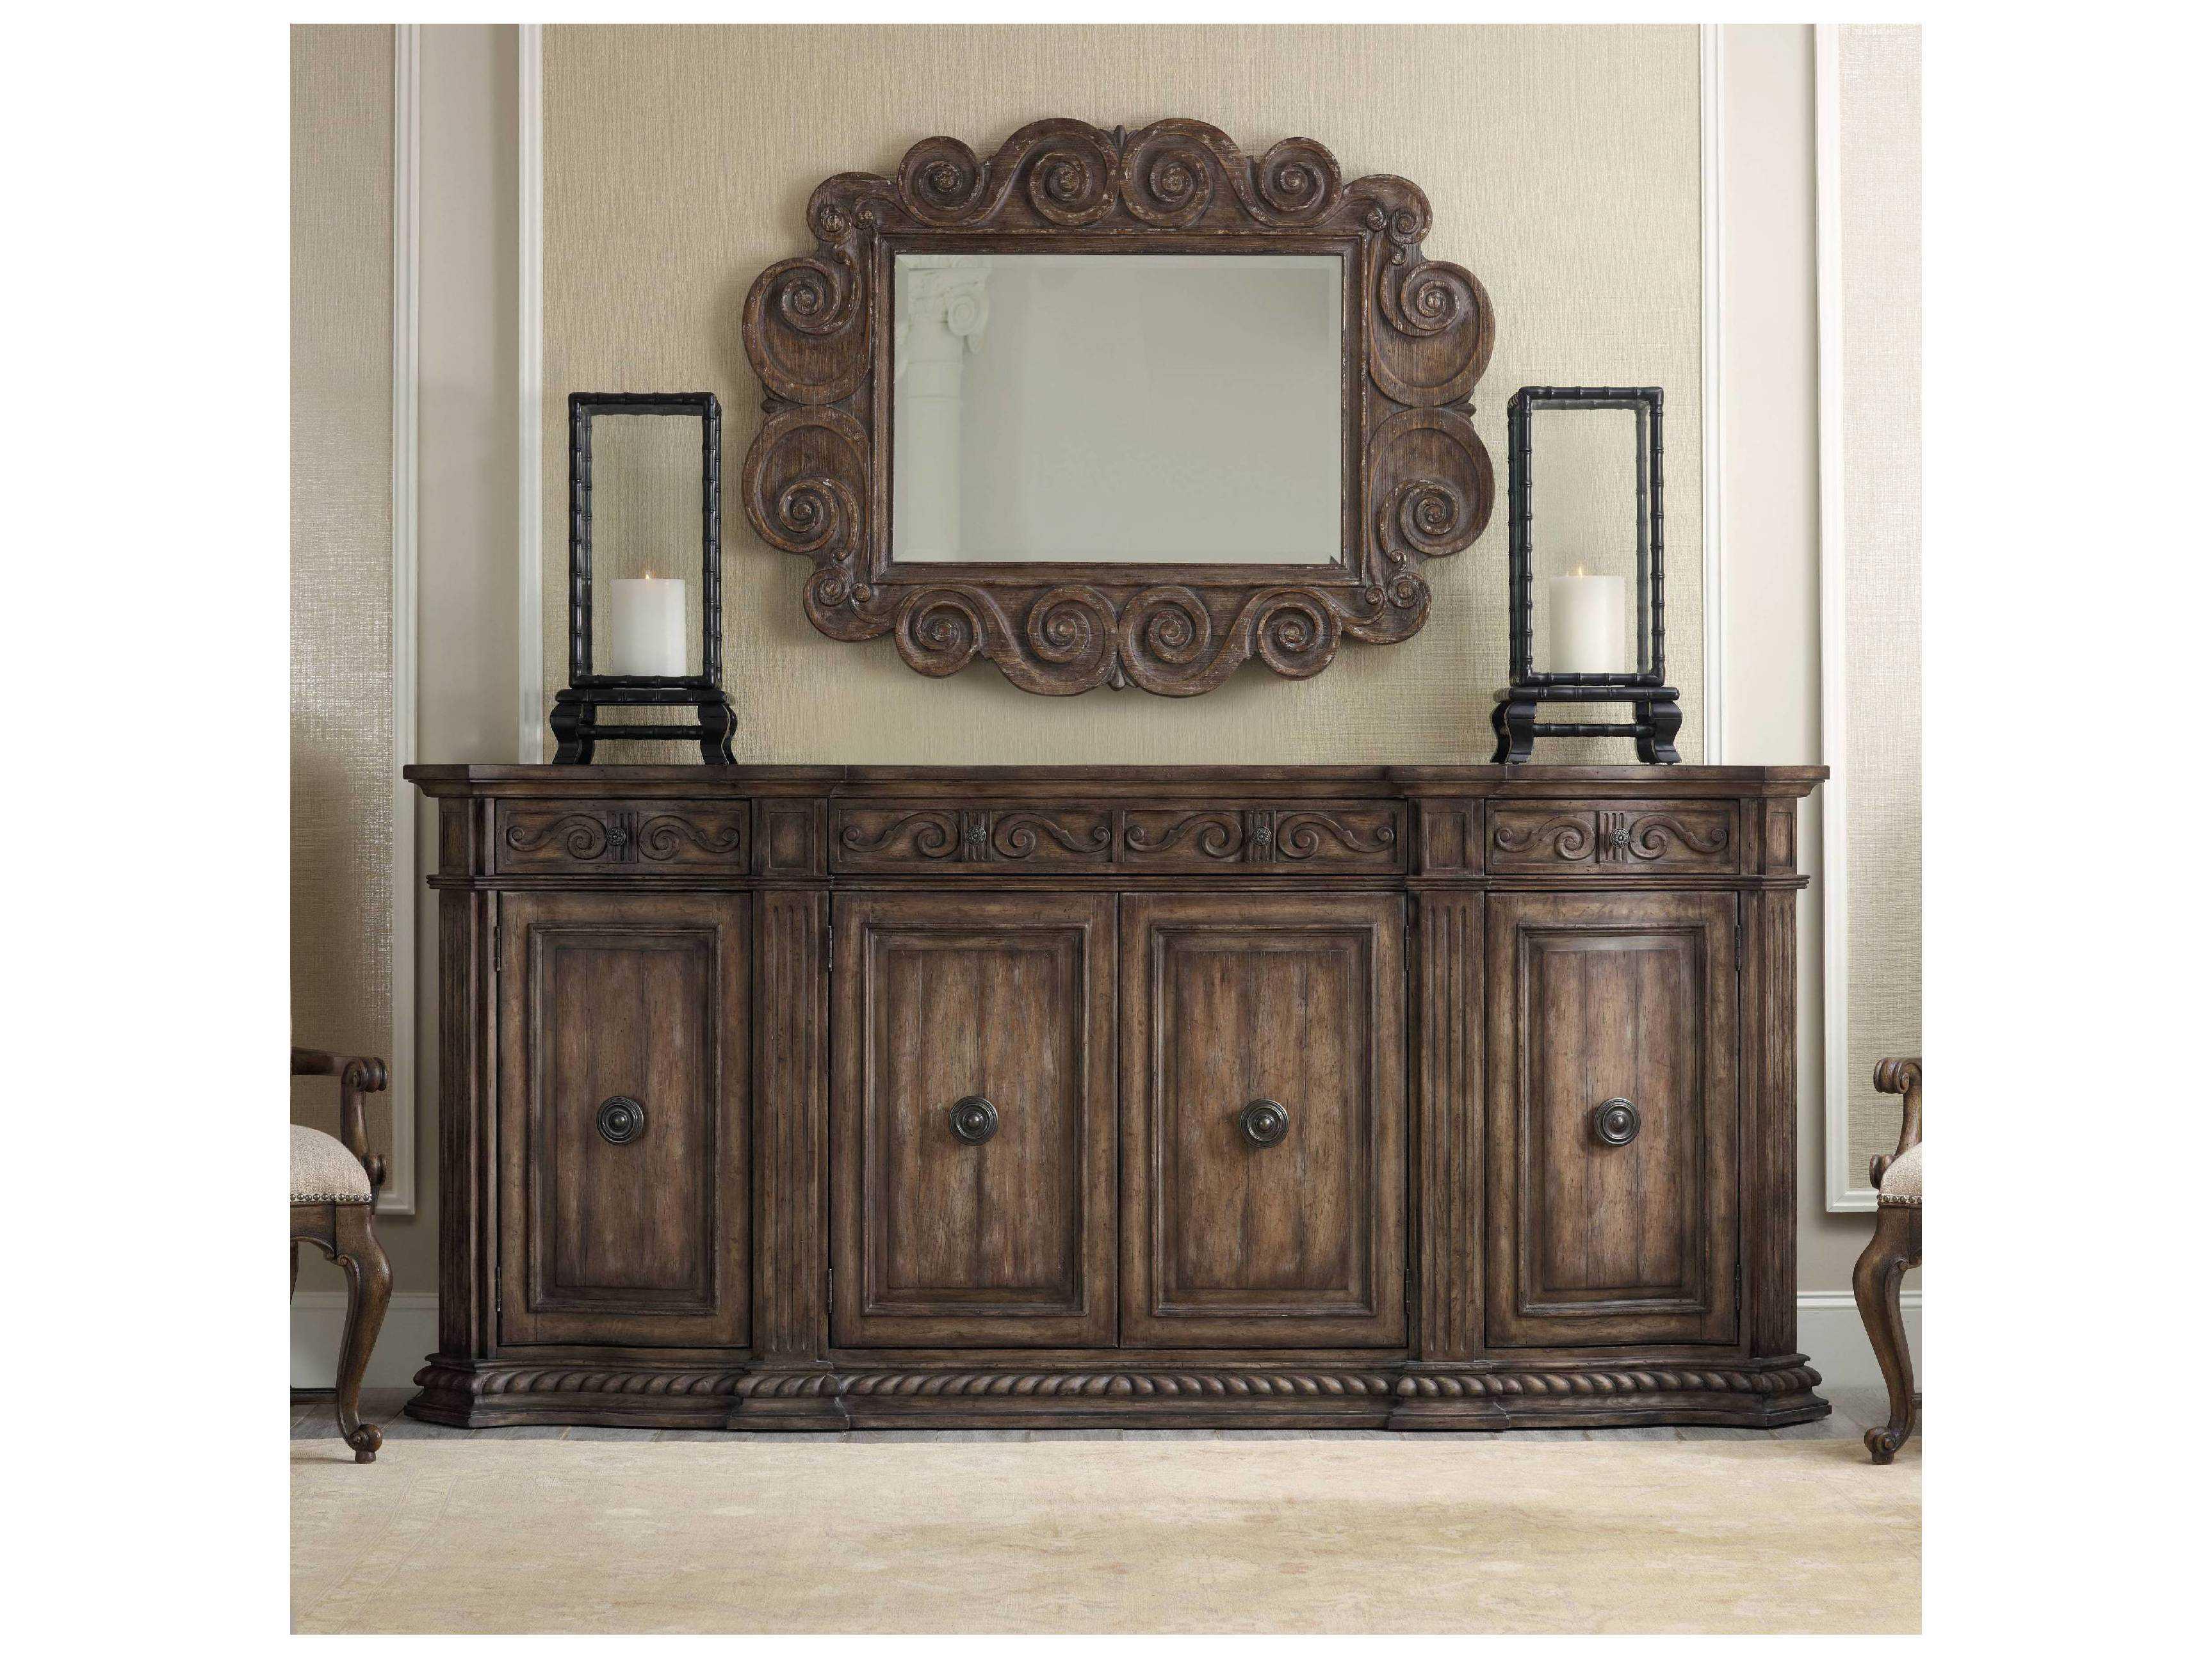 Hooker Furniture Rhapsody Rustic Walnut 96''l X 20''w Rectangular Credenza  Buffet Intended For Rustic Walnut Buffets (View 17 of 30)